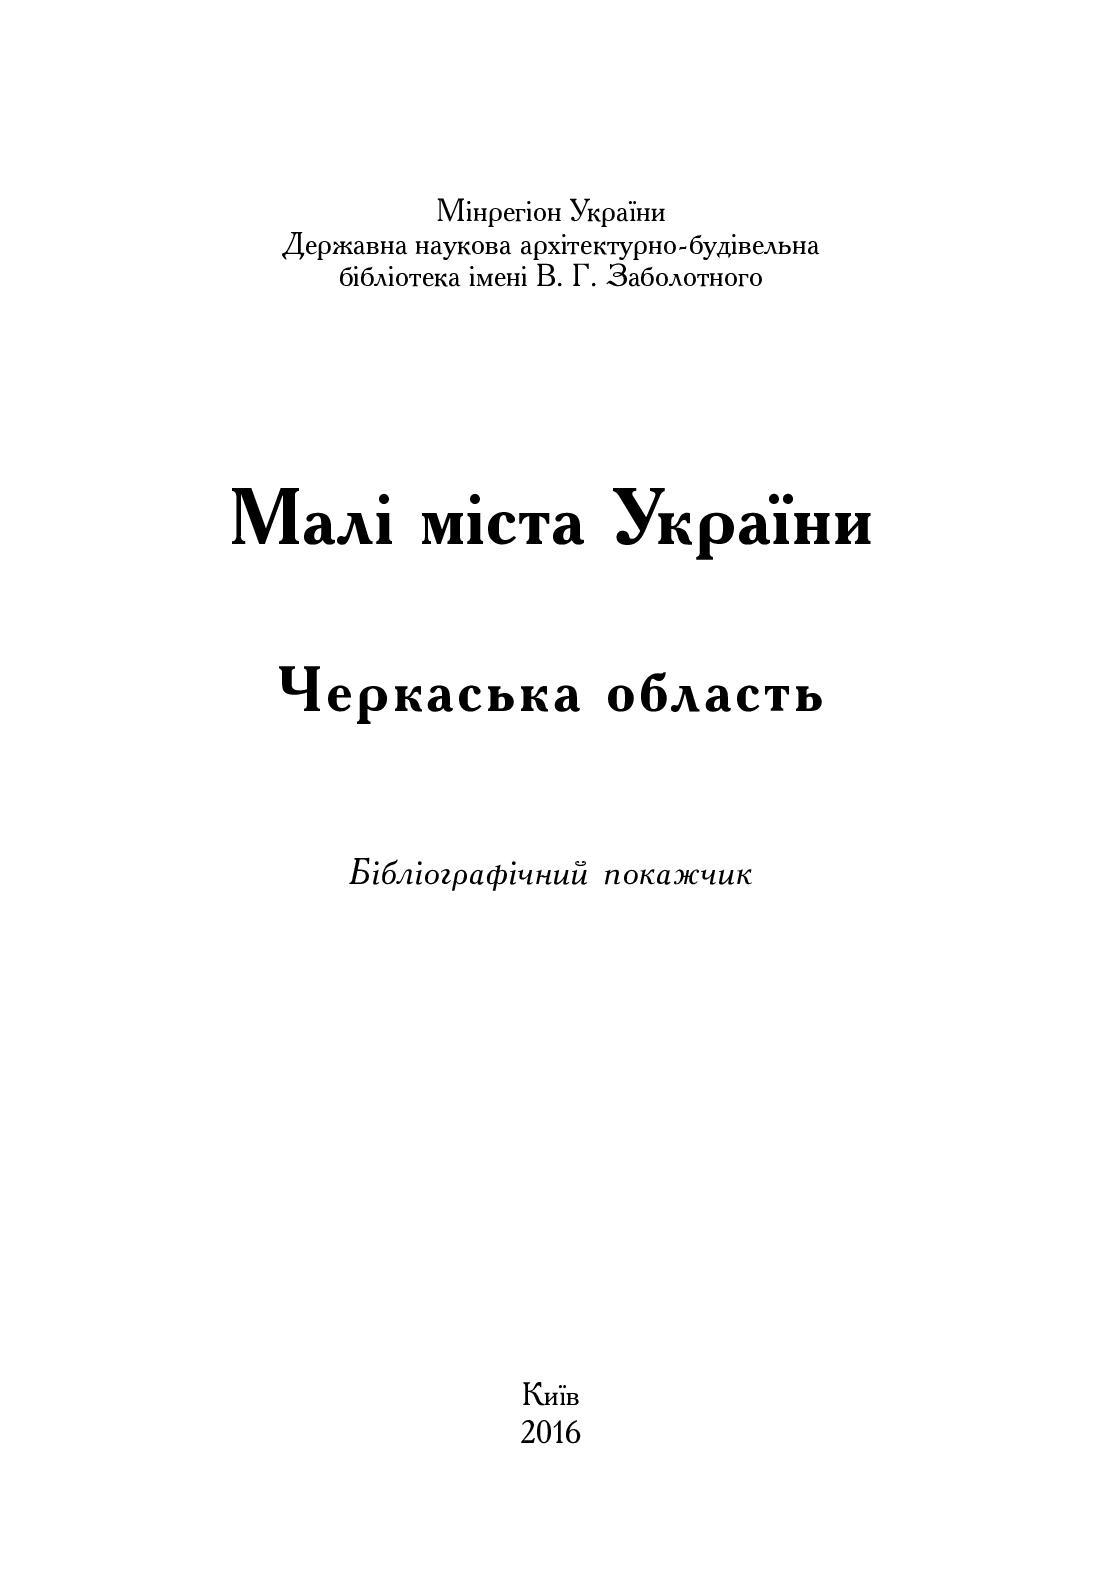 Черкаська область 03 03 2017